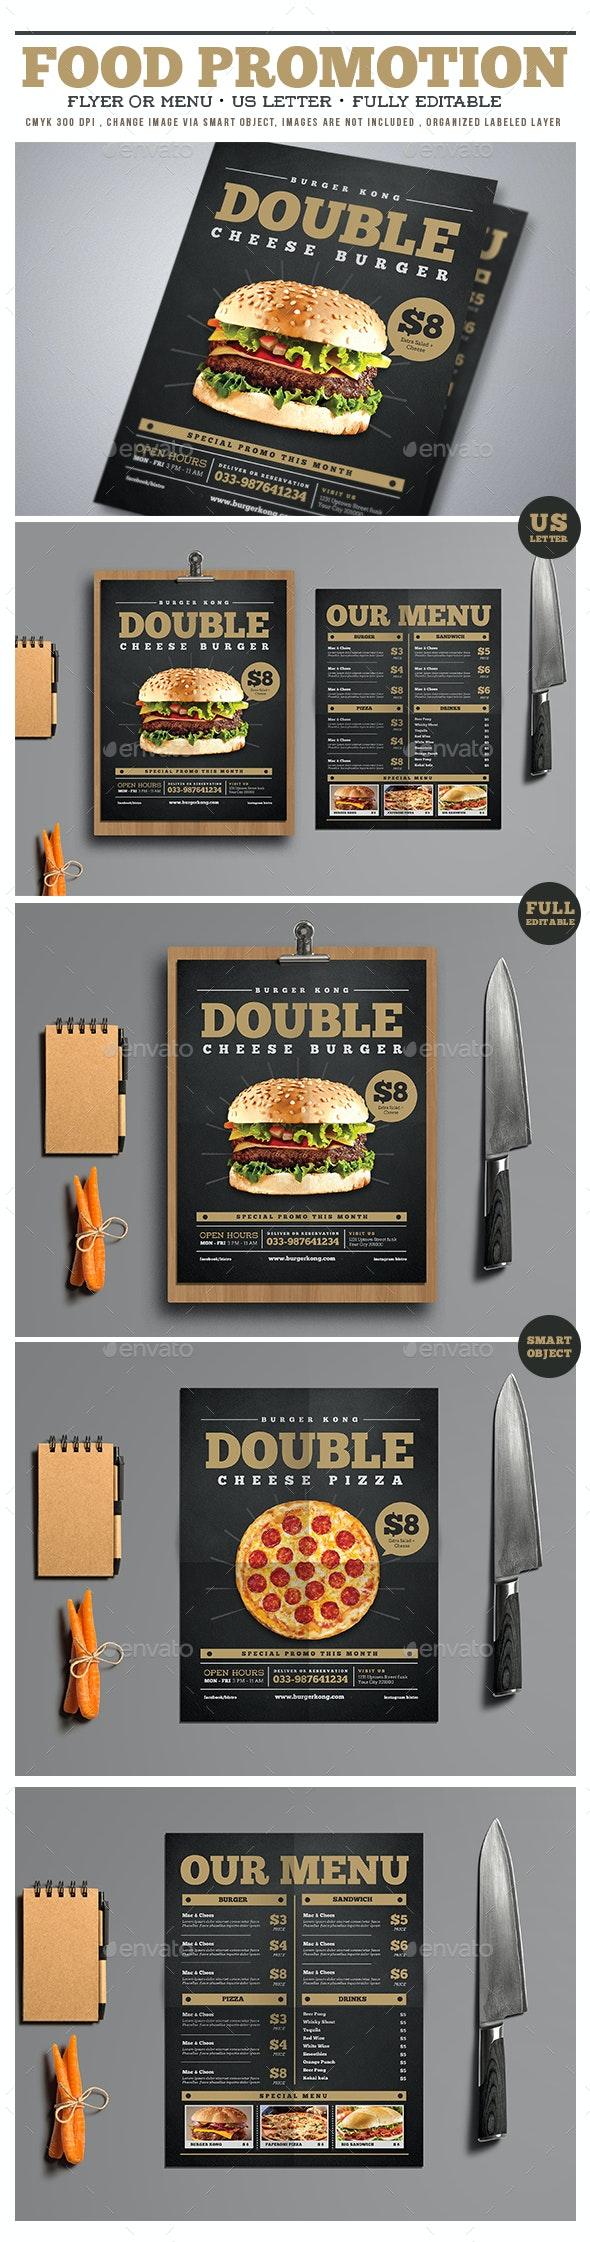 Food Promotion Flyer/Menu - Restaurant Flyers